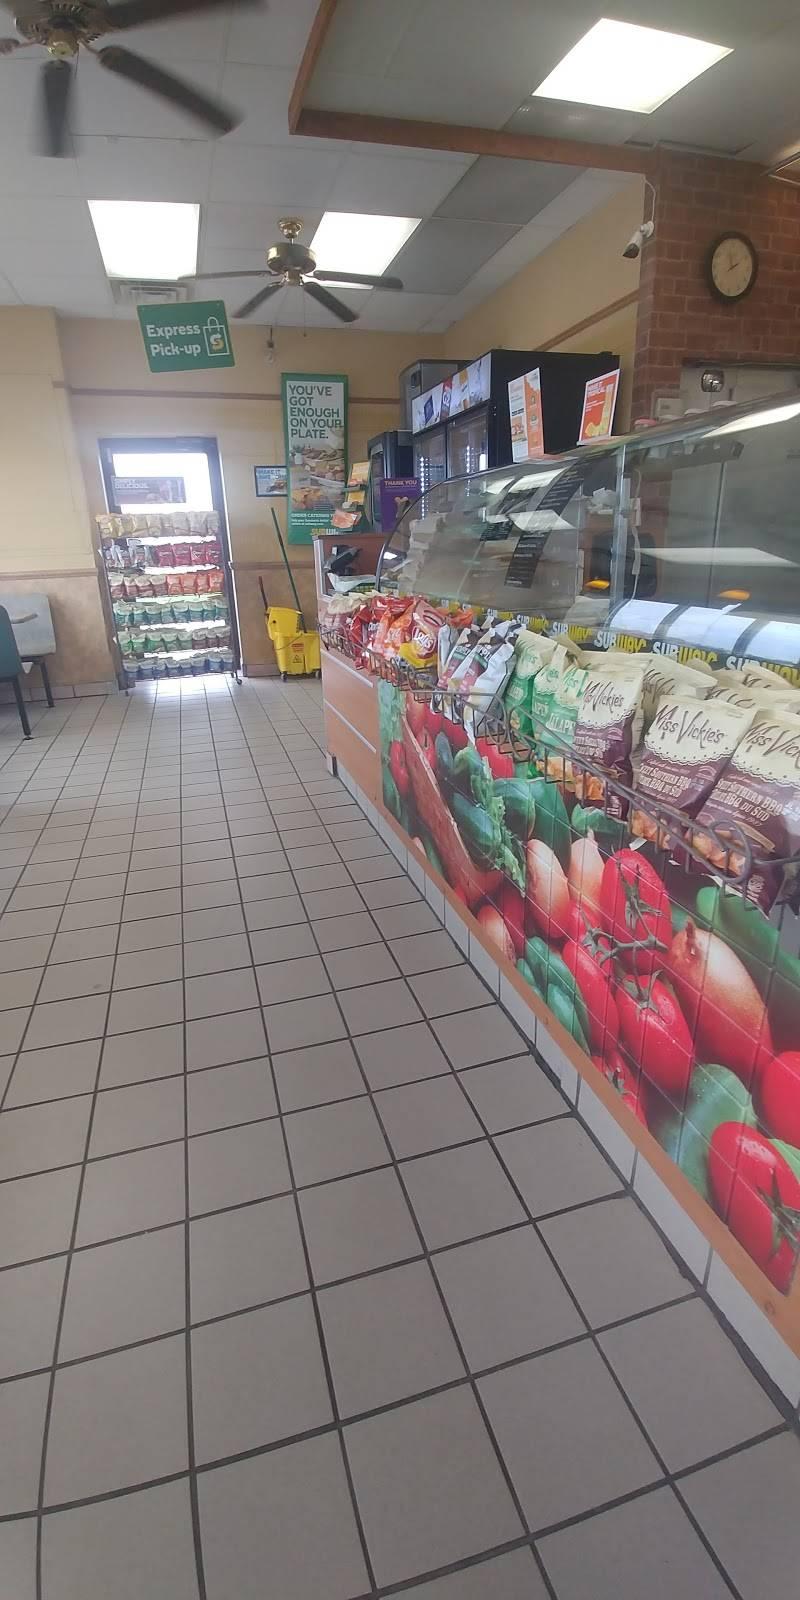 Subway   restaurant   3313 ON-115, Newcastle, ON L1B 1L9, Canada   9059874438 OR +1 905-987-4438